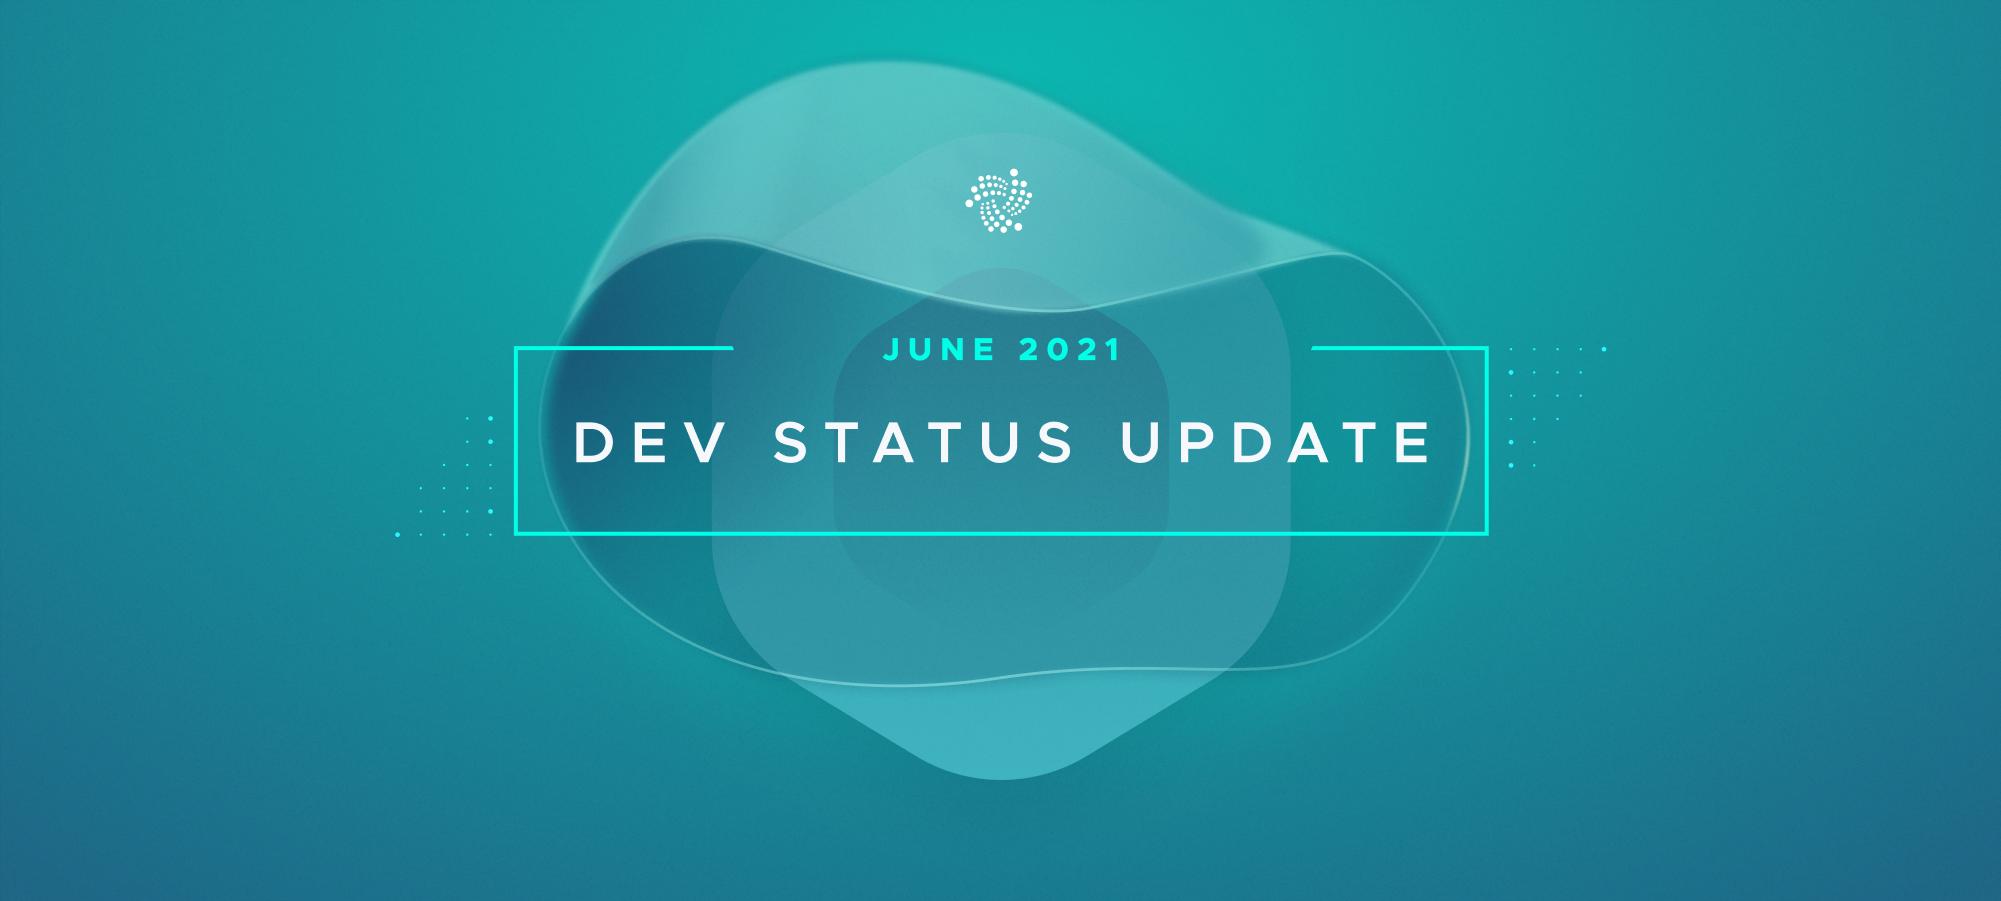 Dev Status Update - June 2021